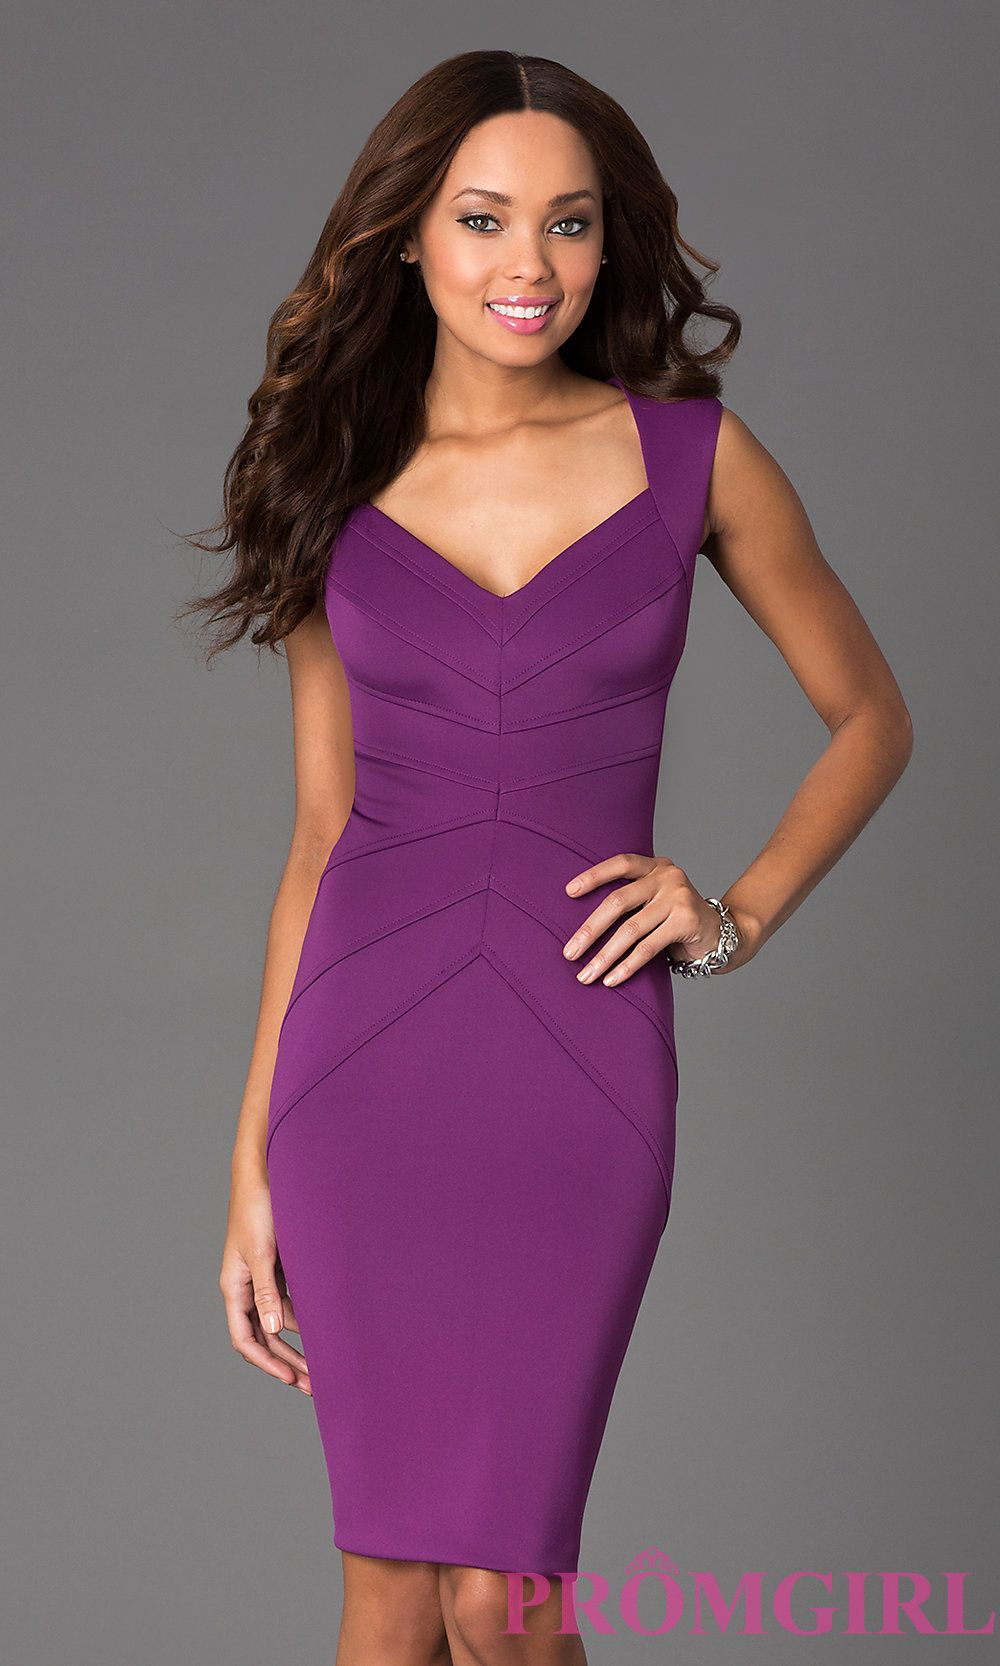 Prom Dresses, Plus Size Dresses, Prom Shoes: Sleeveless Knee Length ...